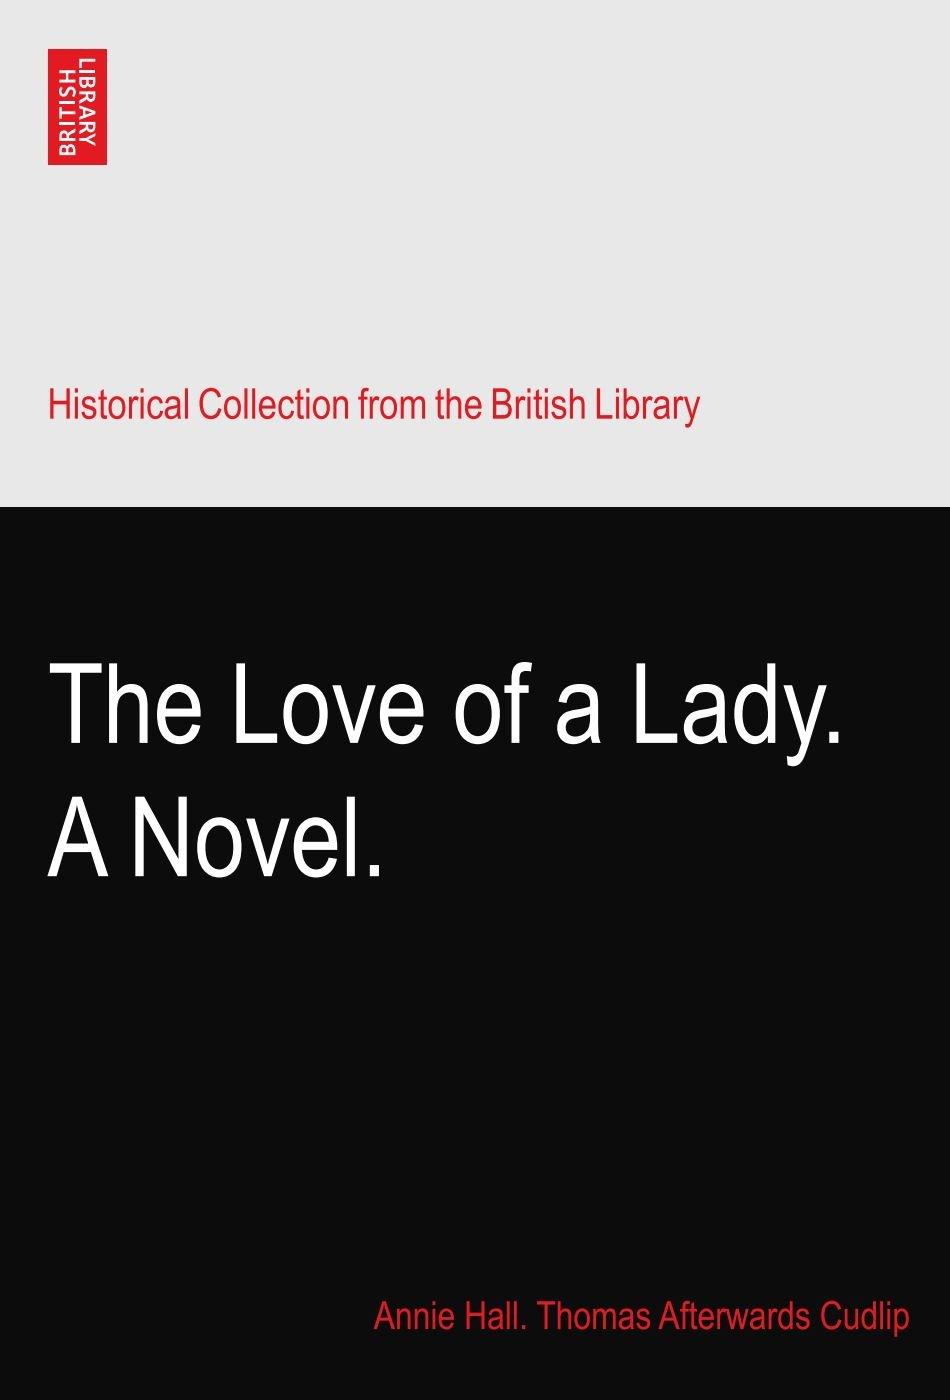 The Love of a Lady. A Novel. pdf